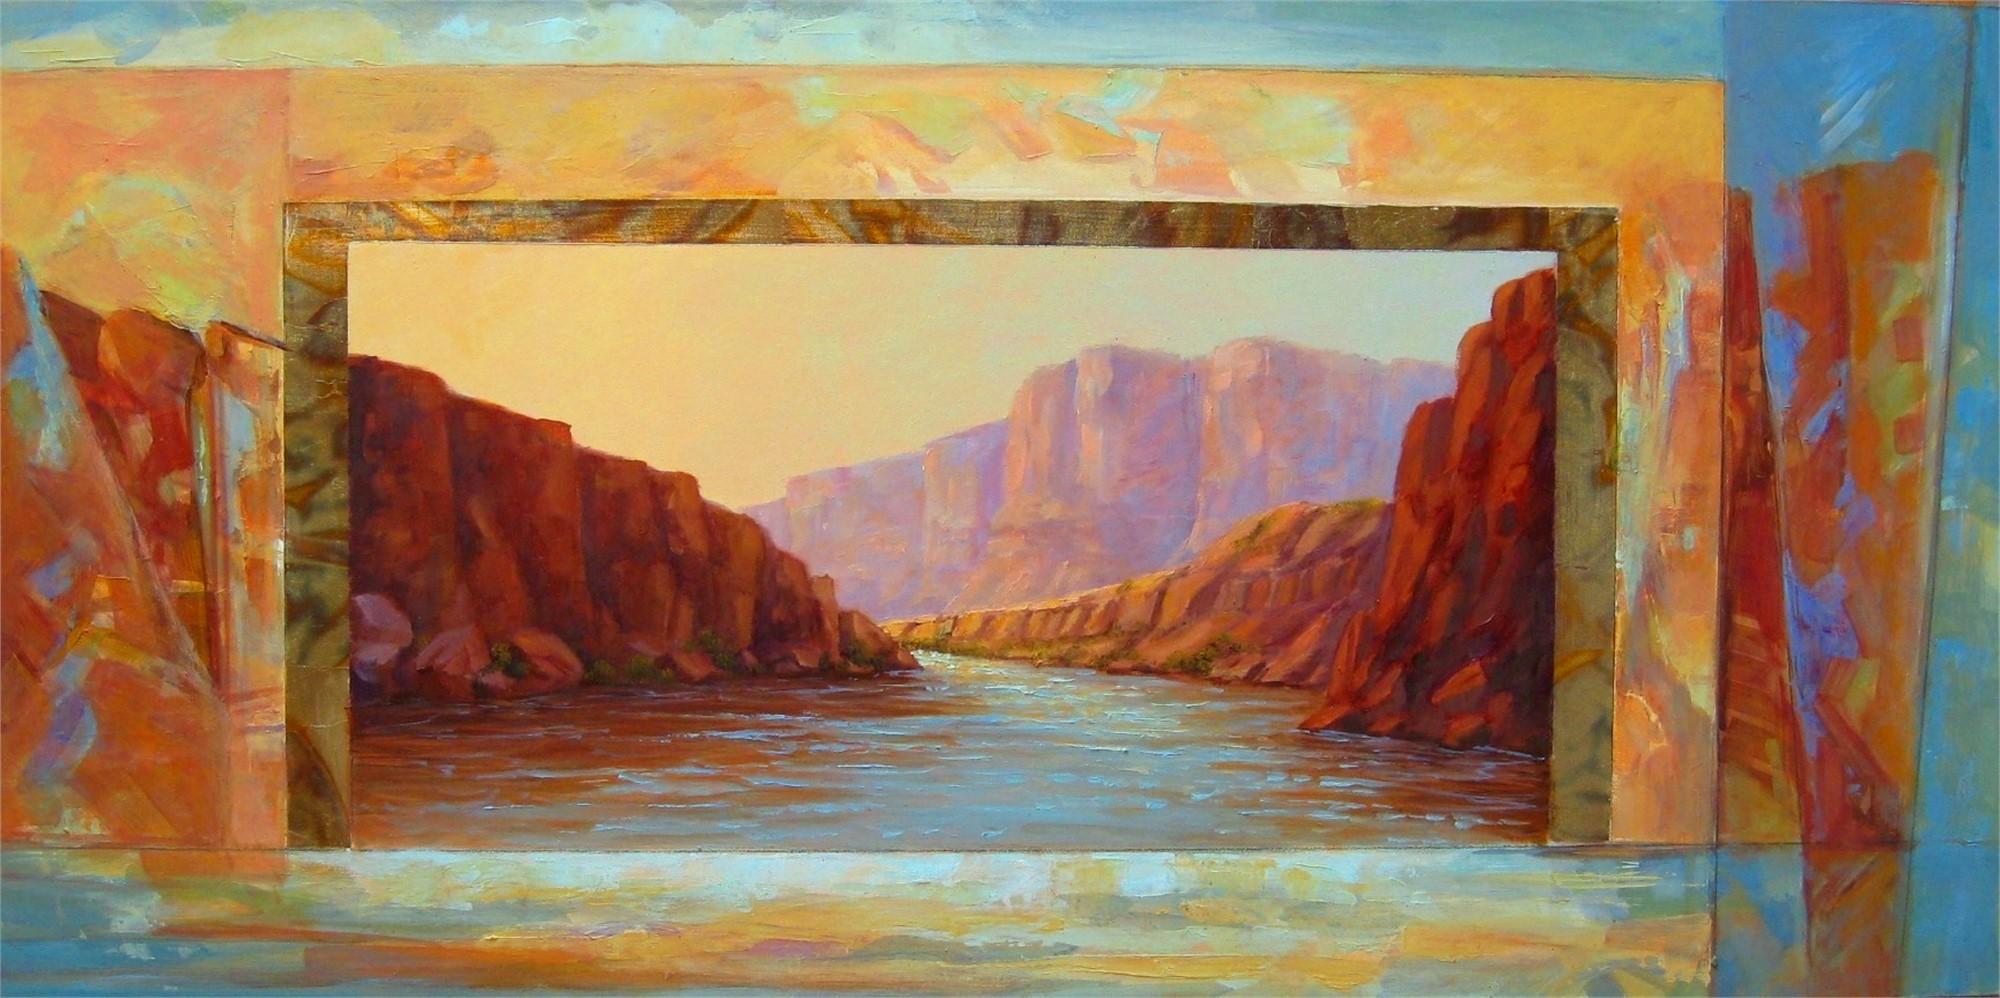 Drifting Down the Colorado by Marlys Mallét & Michael Redhawk